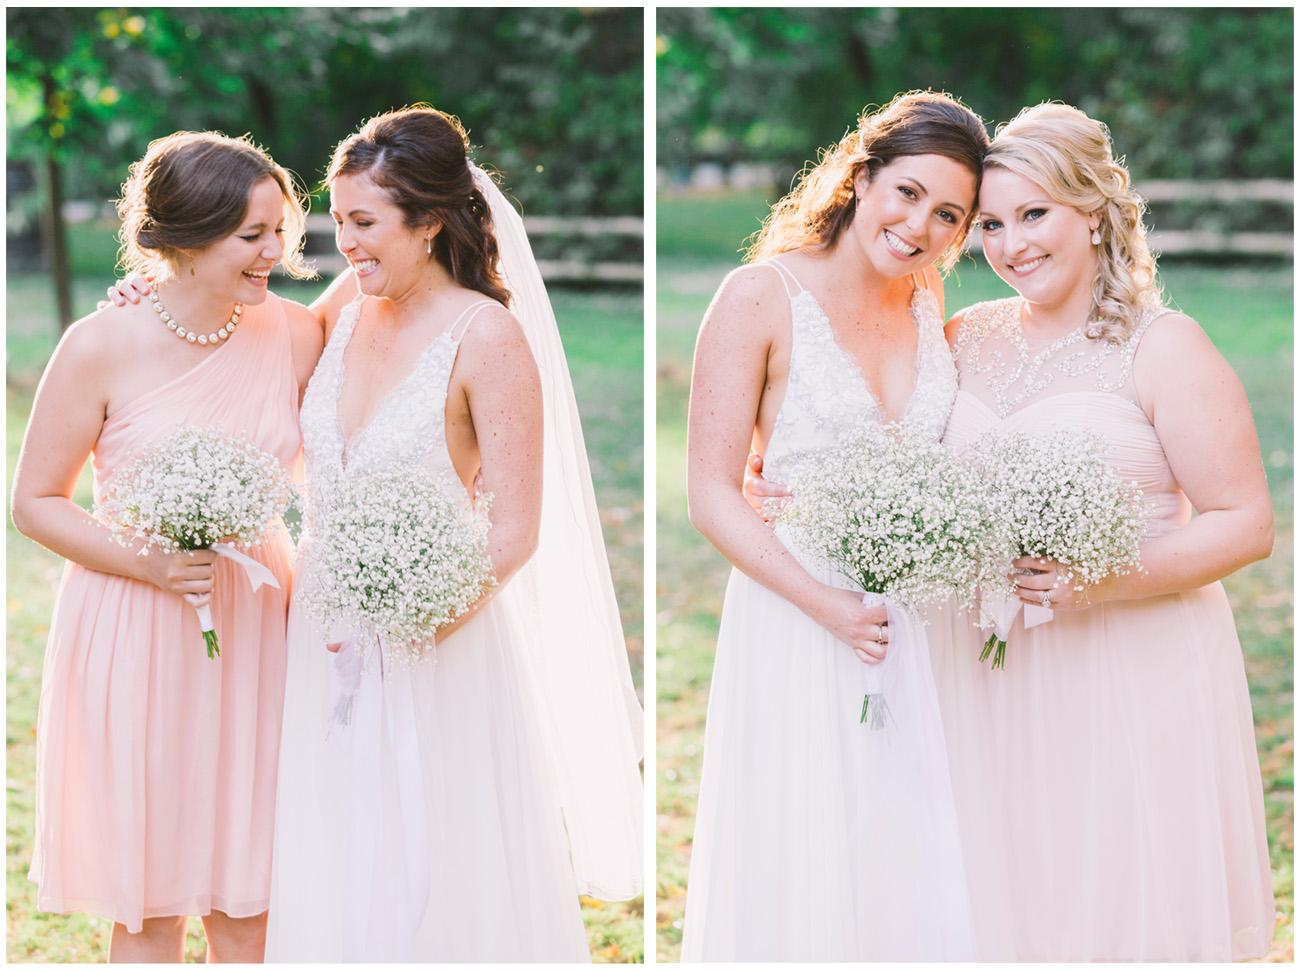 Bride and bridesmaids photos.